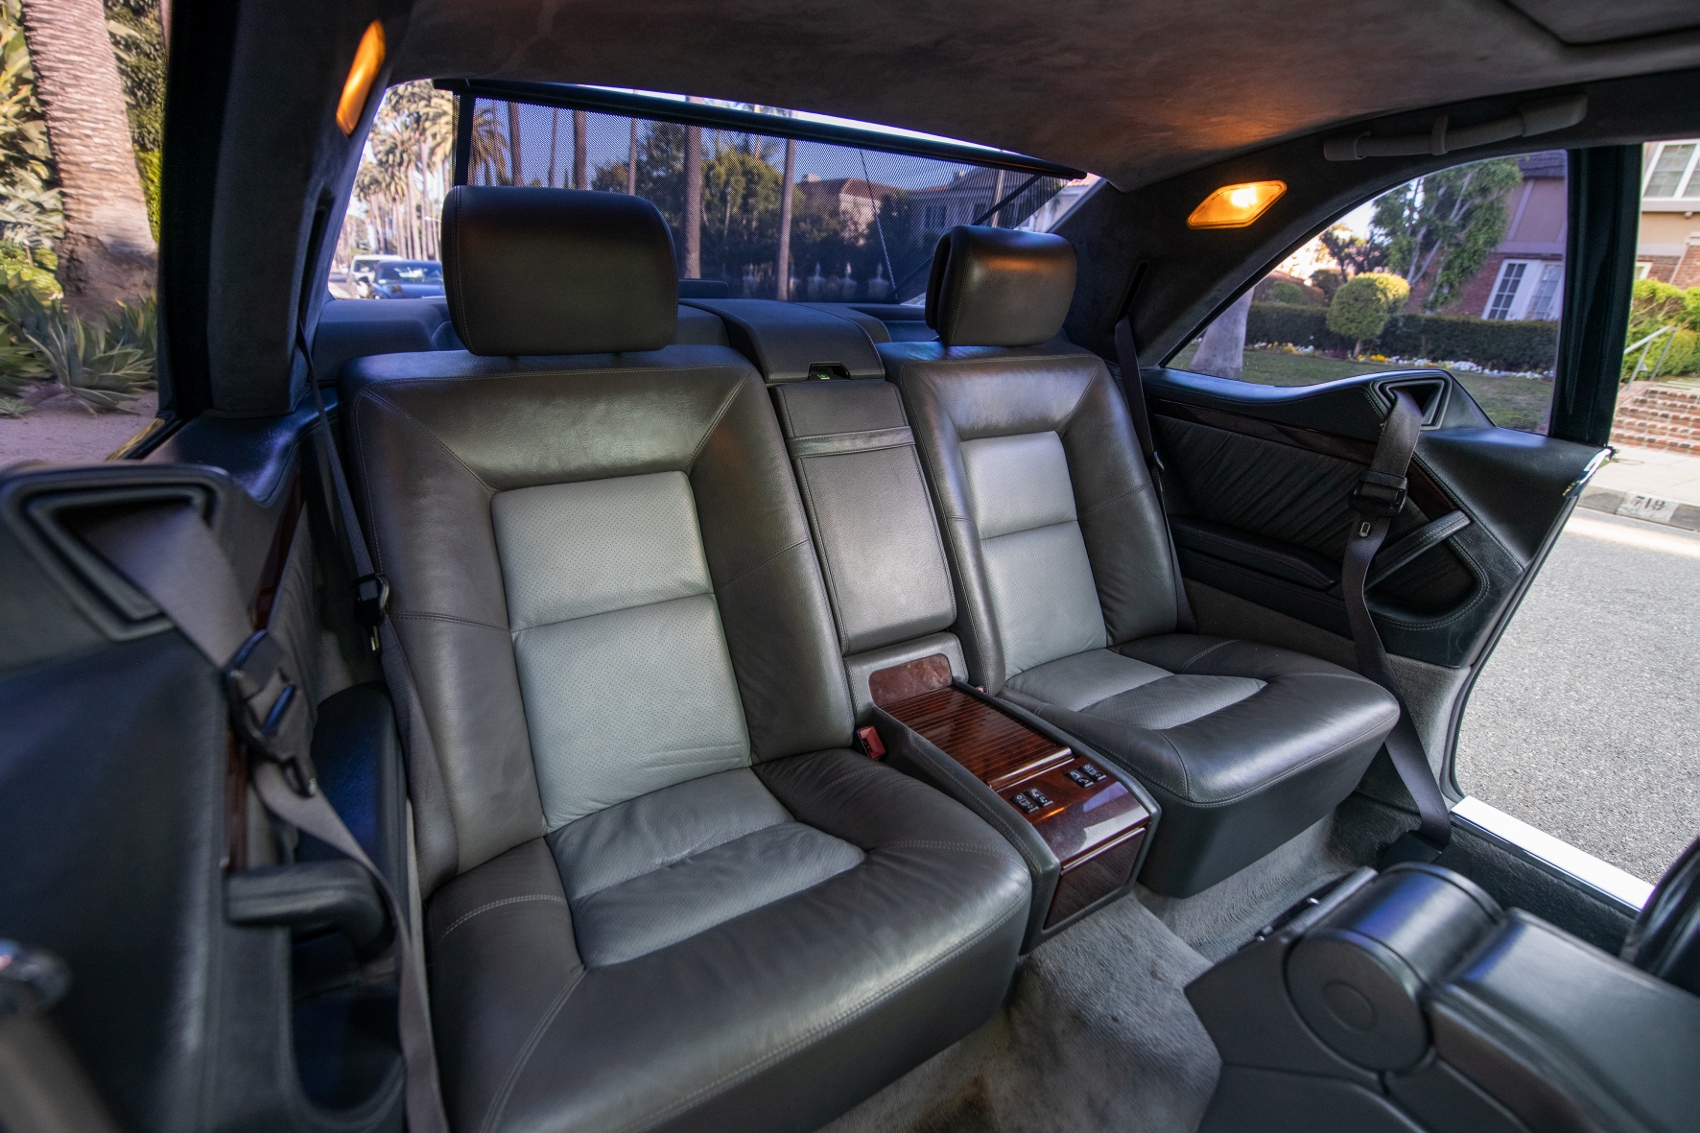 Pozrite si Mercedes S600 Michaela Jordana z roku 1996 lOKrEUoXgs lorinsercl600ex-jordanrearseatssbev